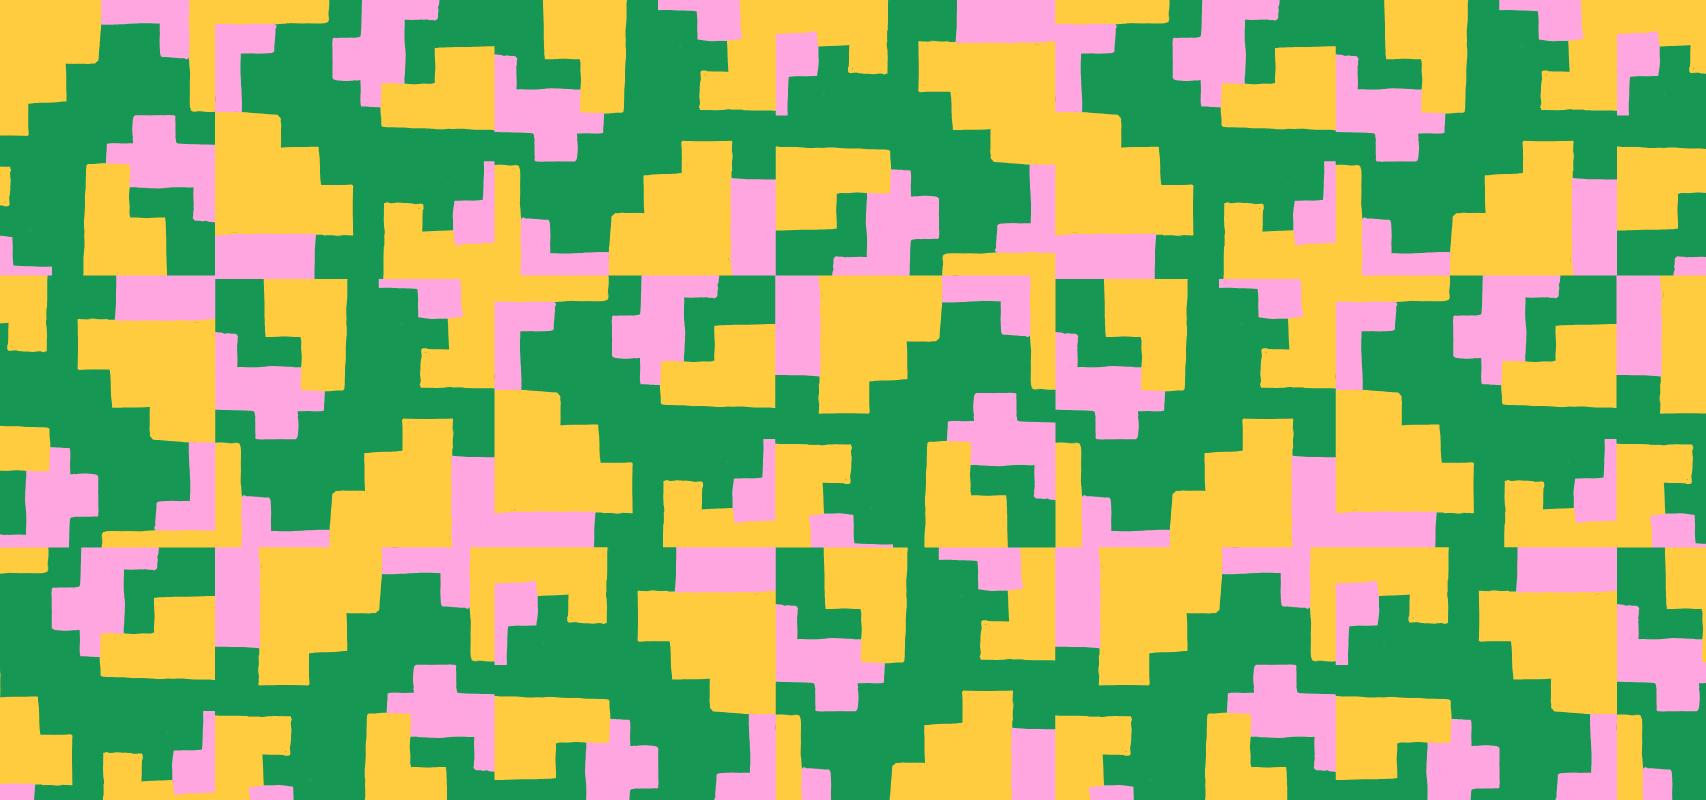 LK_2020_Site_Illustration_PixelPattern